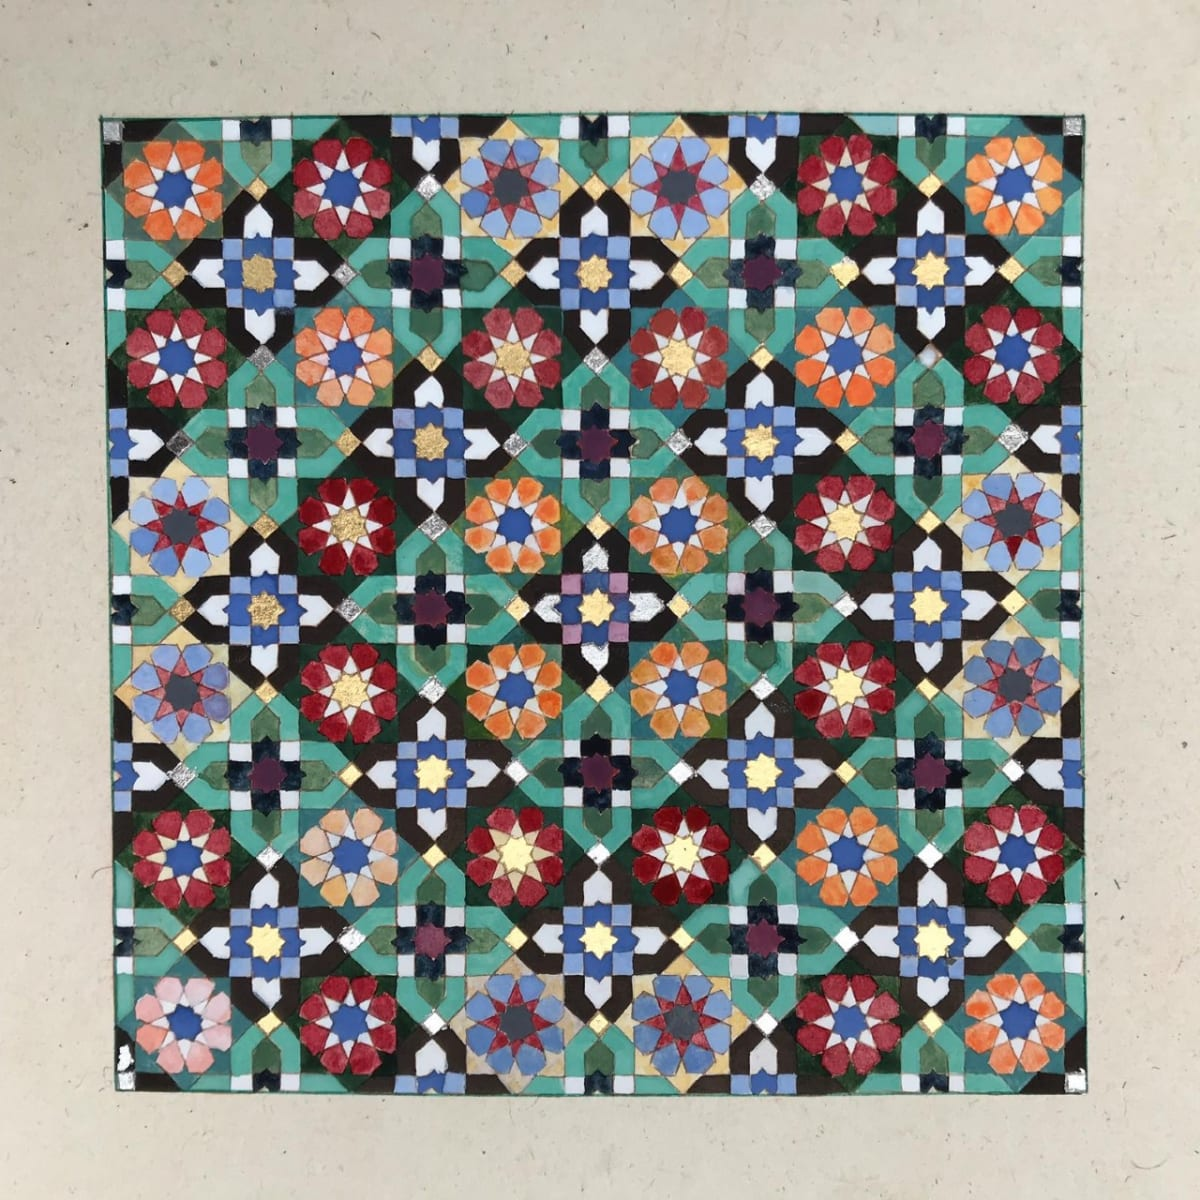 Elisabeth Deane b. 1985Amal, 2020 Italian gold leaf, palladium leaf, natural pigments and Arabic gum on handmade Indian hemp paper 15 x 15 cm 5 7/8 x 5 7/8 in